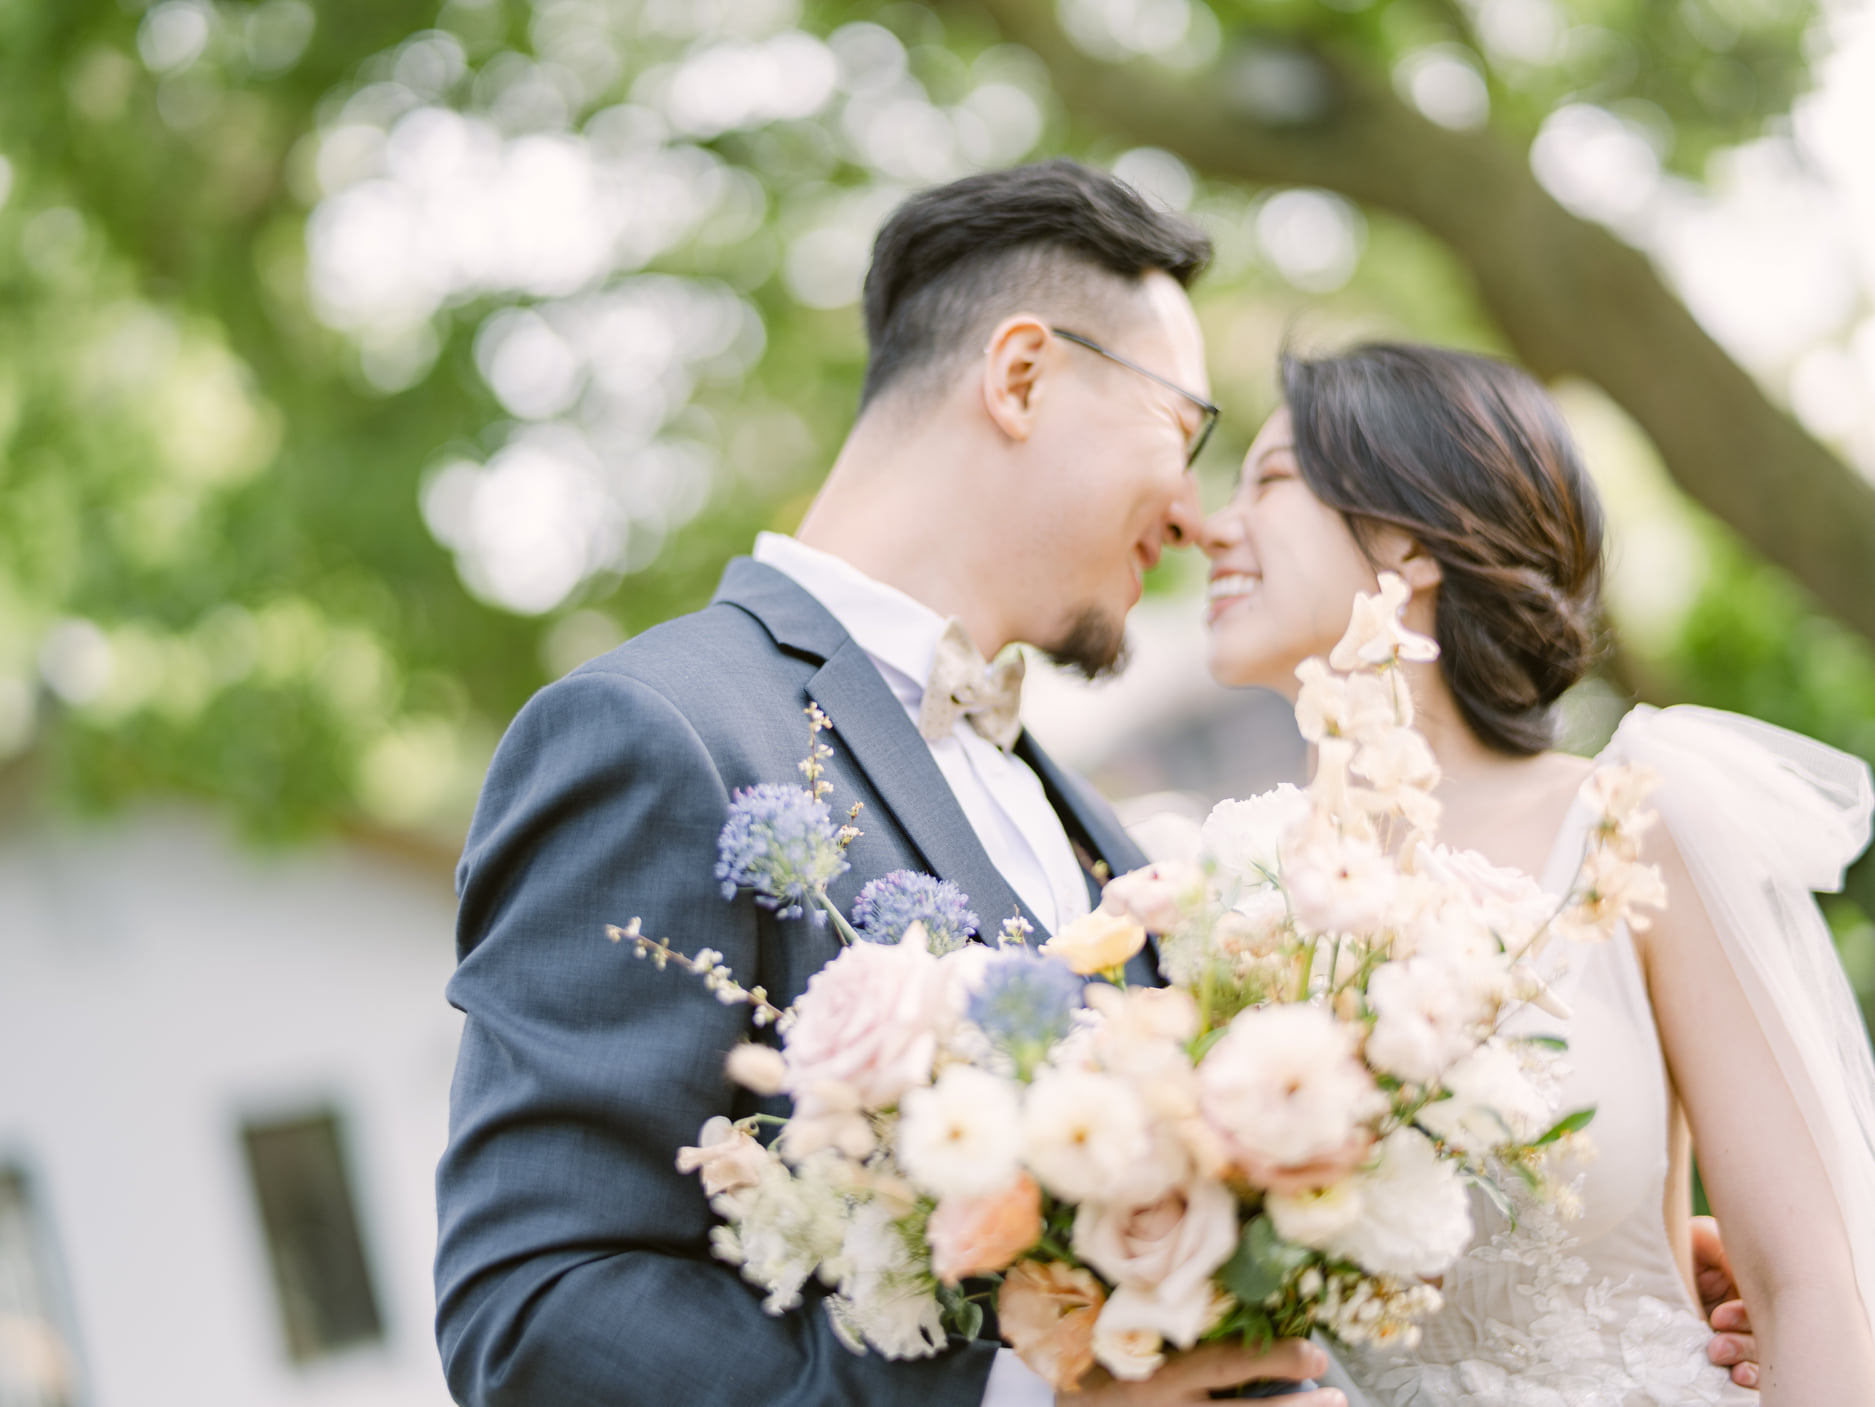 Raymond & Shannal|婚禮主持人|婚禮顧問|婚禮企劃|婚禮服務